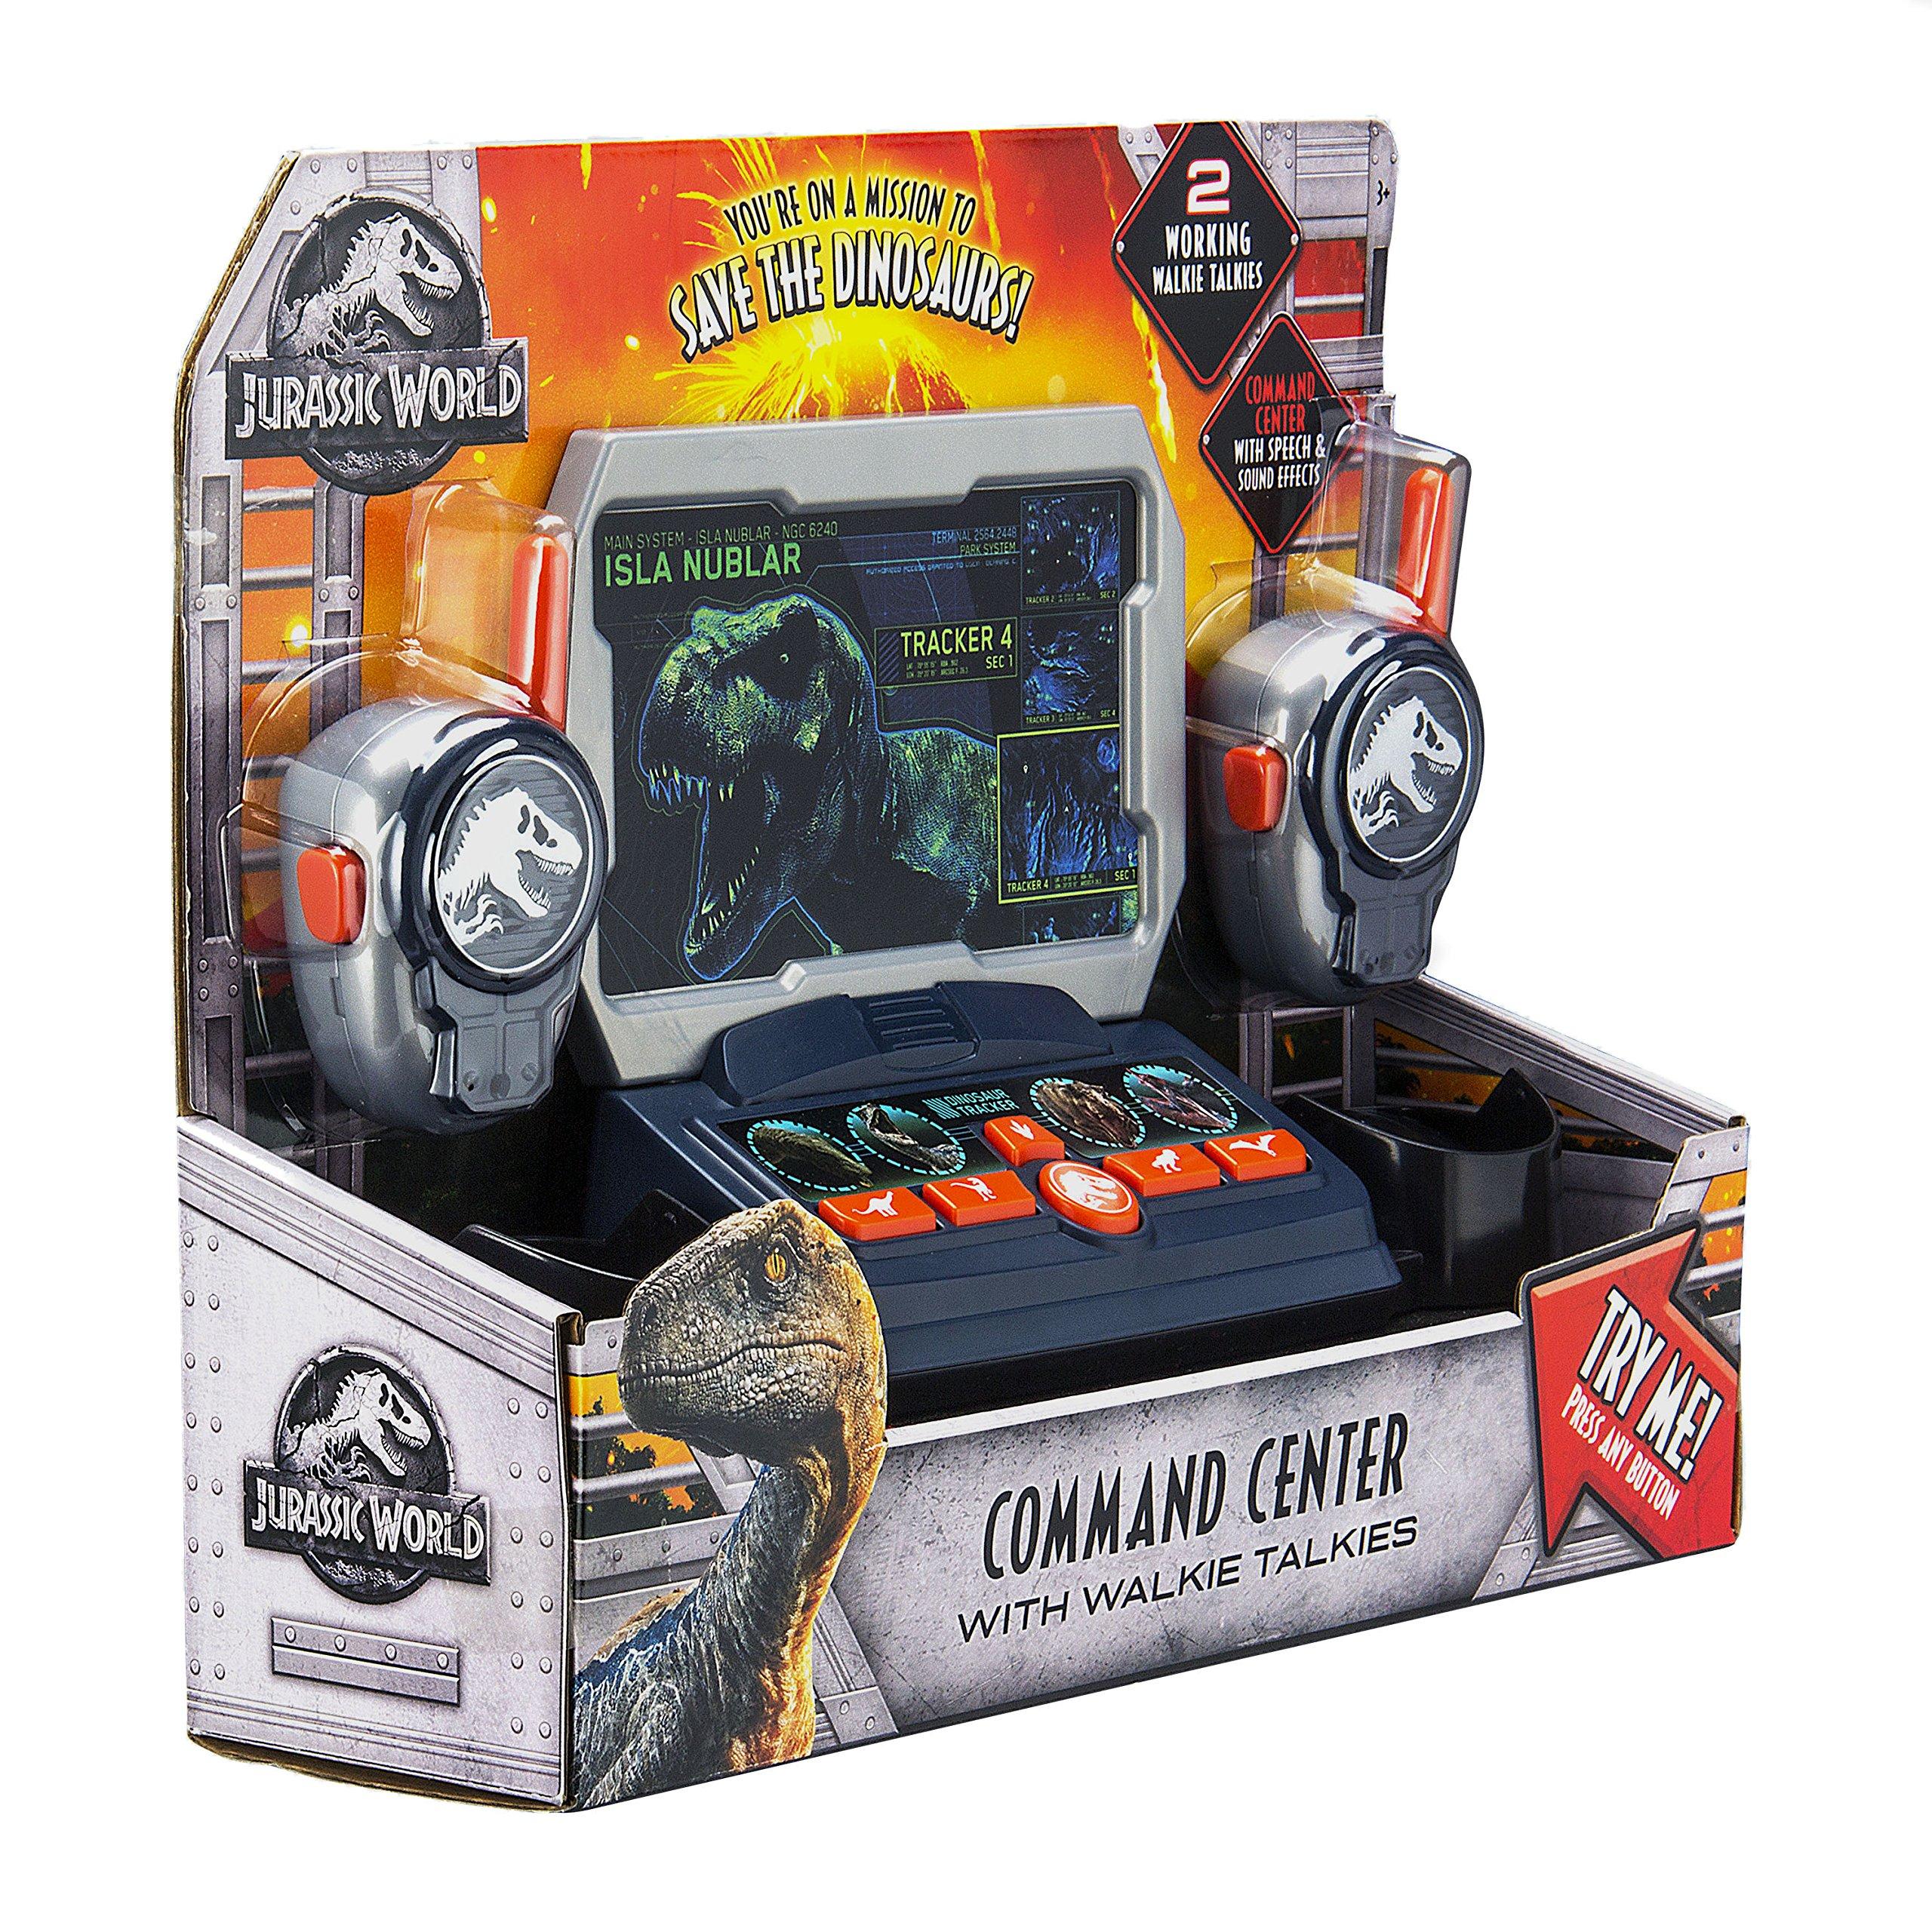 eKids Jurassic World 2 Command Center with Kid Friendly Walkie Talkies and Speech & Sound Effects by eKids (Image #7)